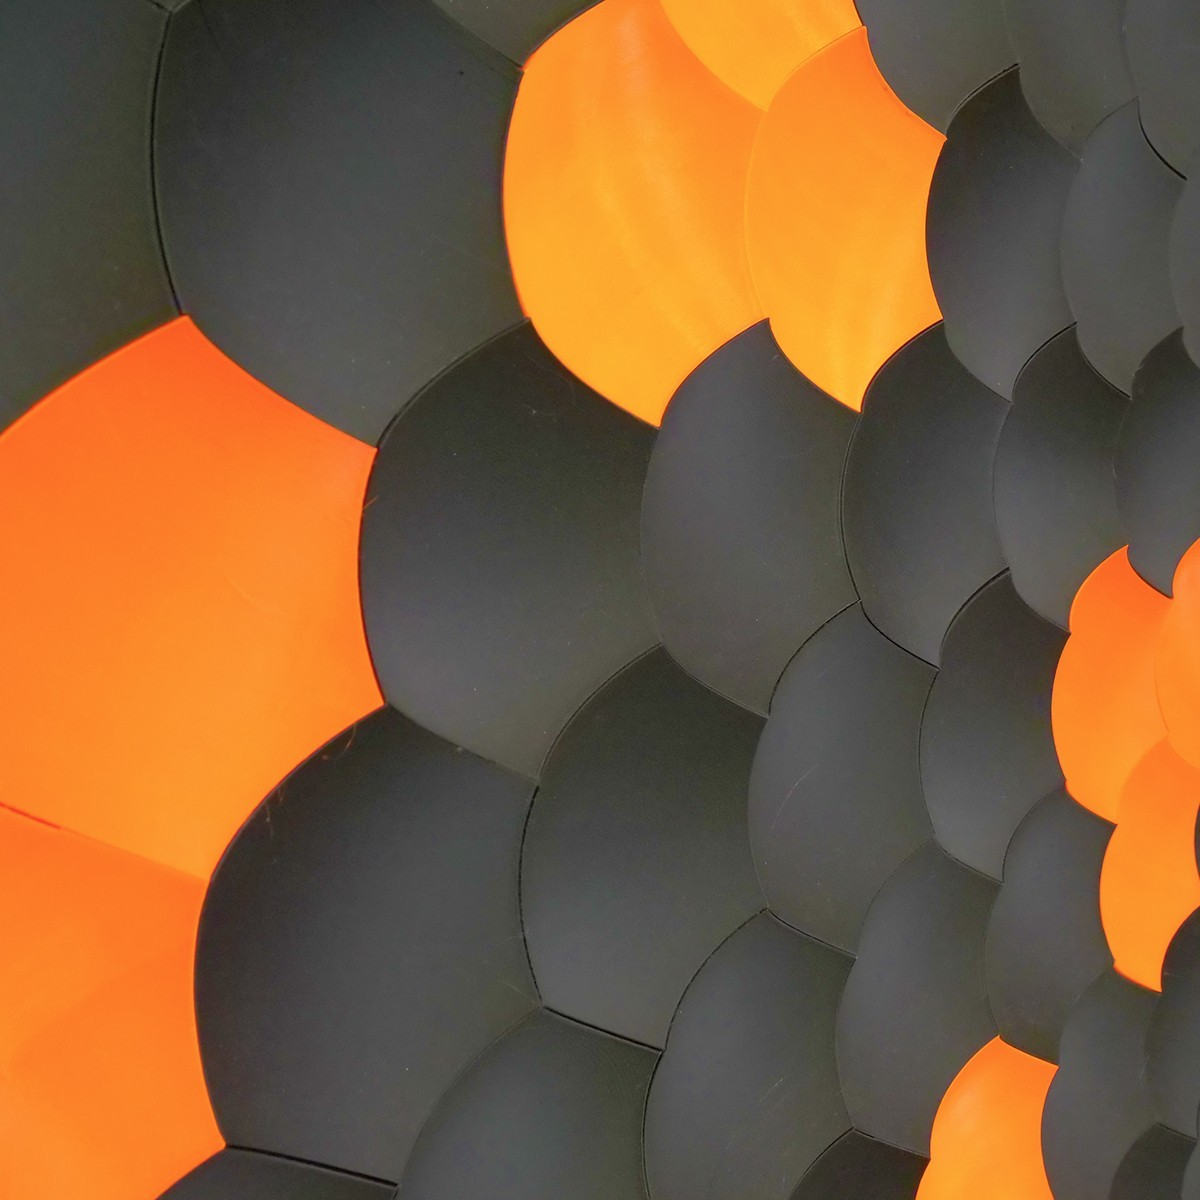 Reception_PrusaLab_Dominik Císar_002.jpg Download free STL file Prusa Reception Tiles - PrusaLab • 3D print model, cisardom